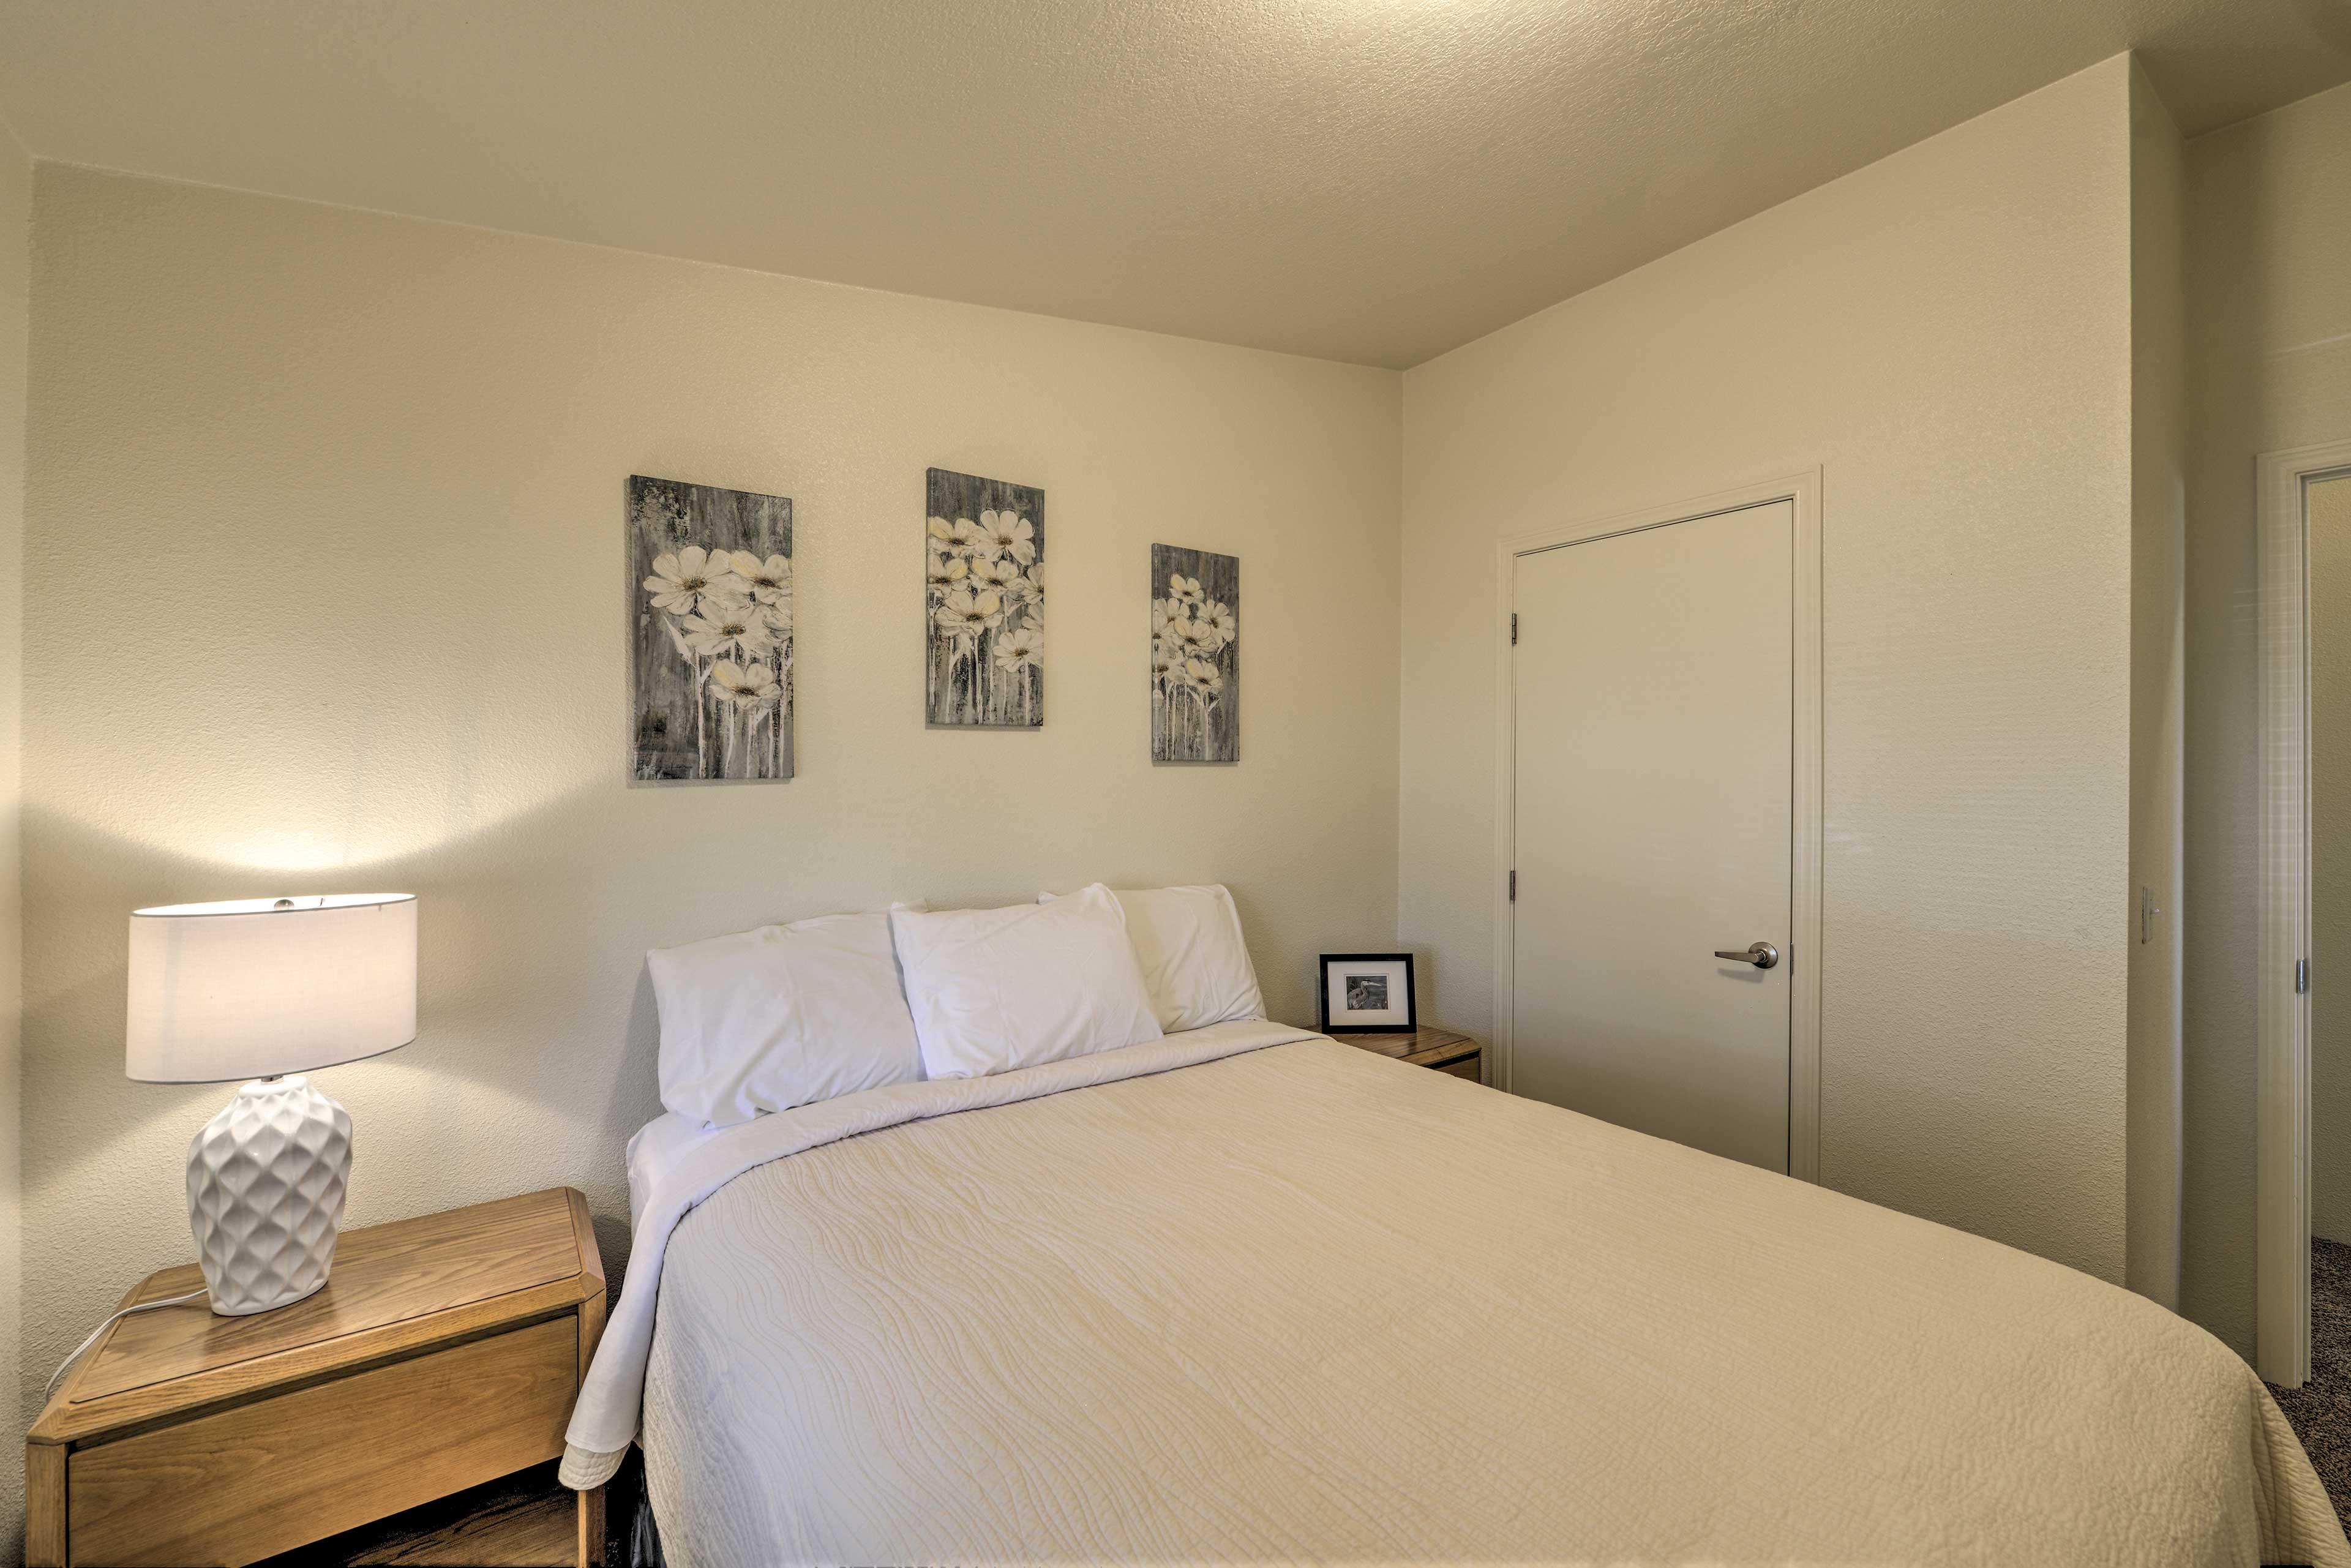 The property boasts tastefully simple decor.